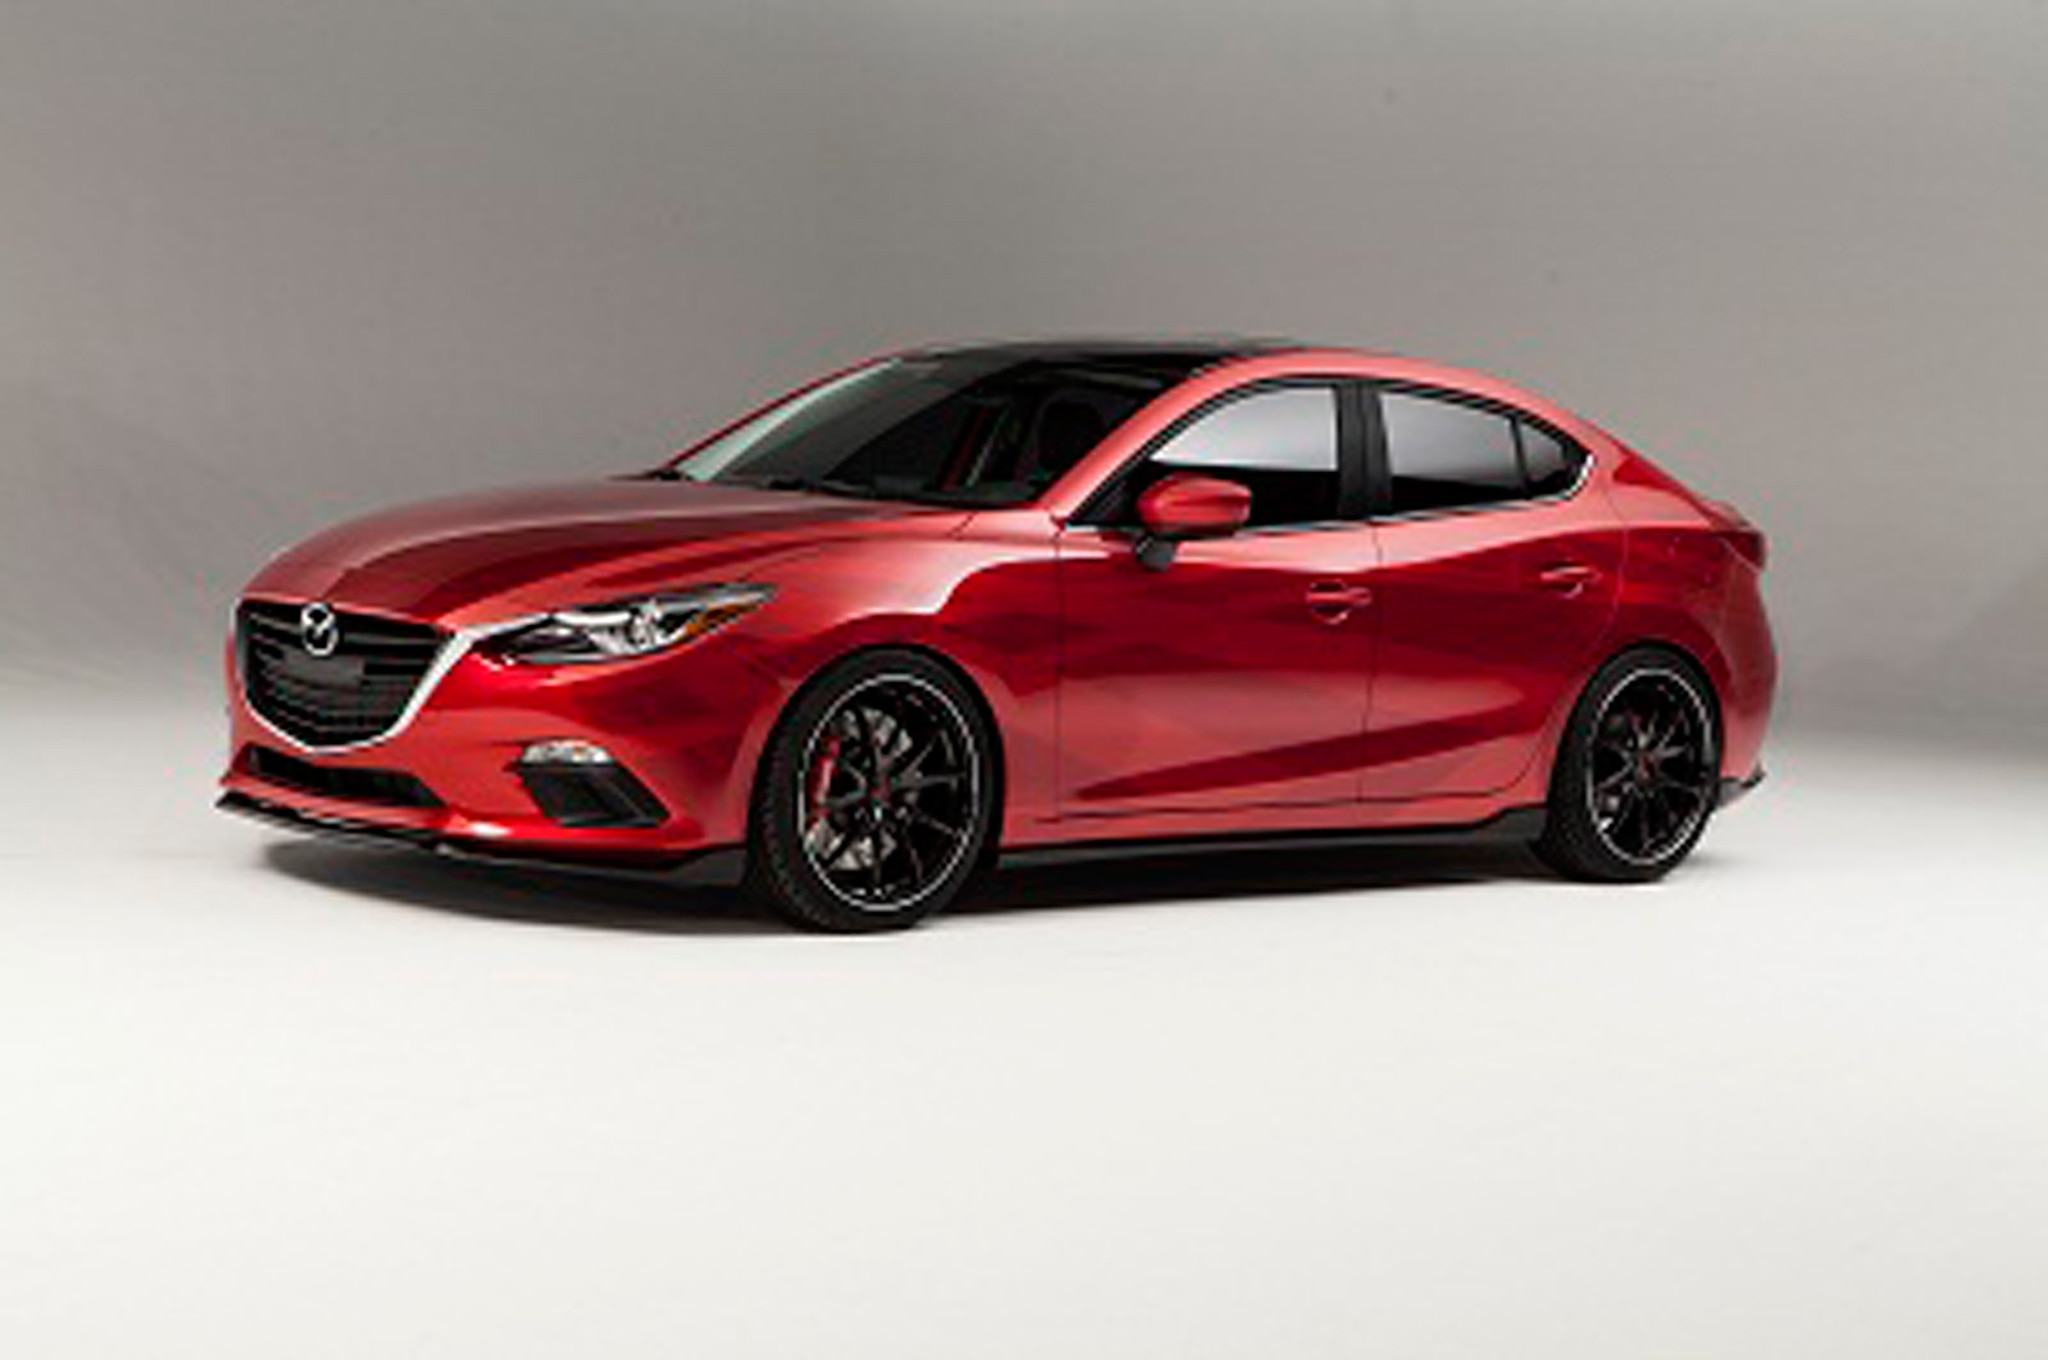 2014 Mazda3 Vector Concpet front three quarter2 2014 mazda 6 i grand touring driven automobile magazine  at cos-gaming.co